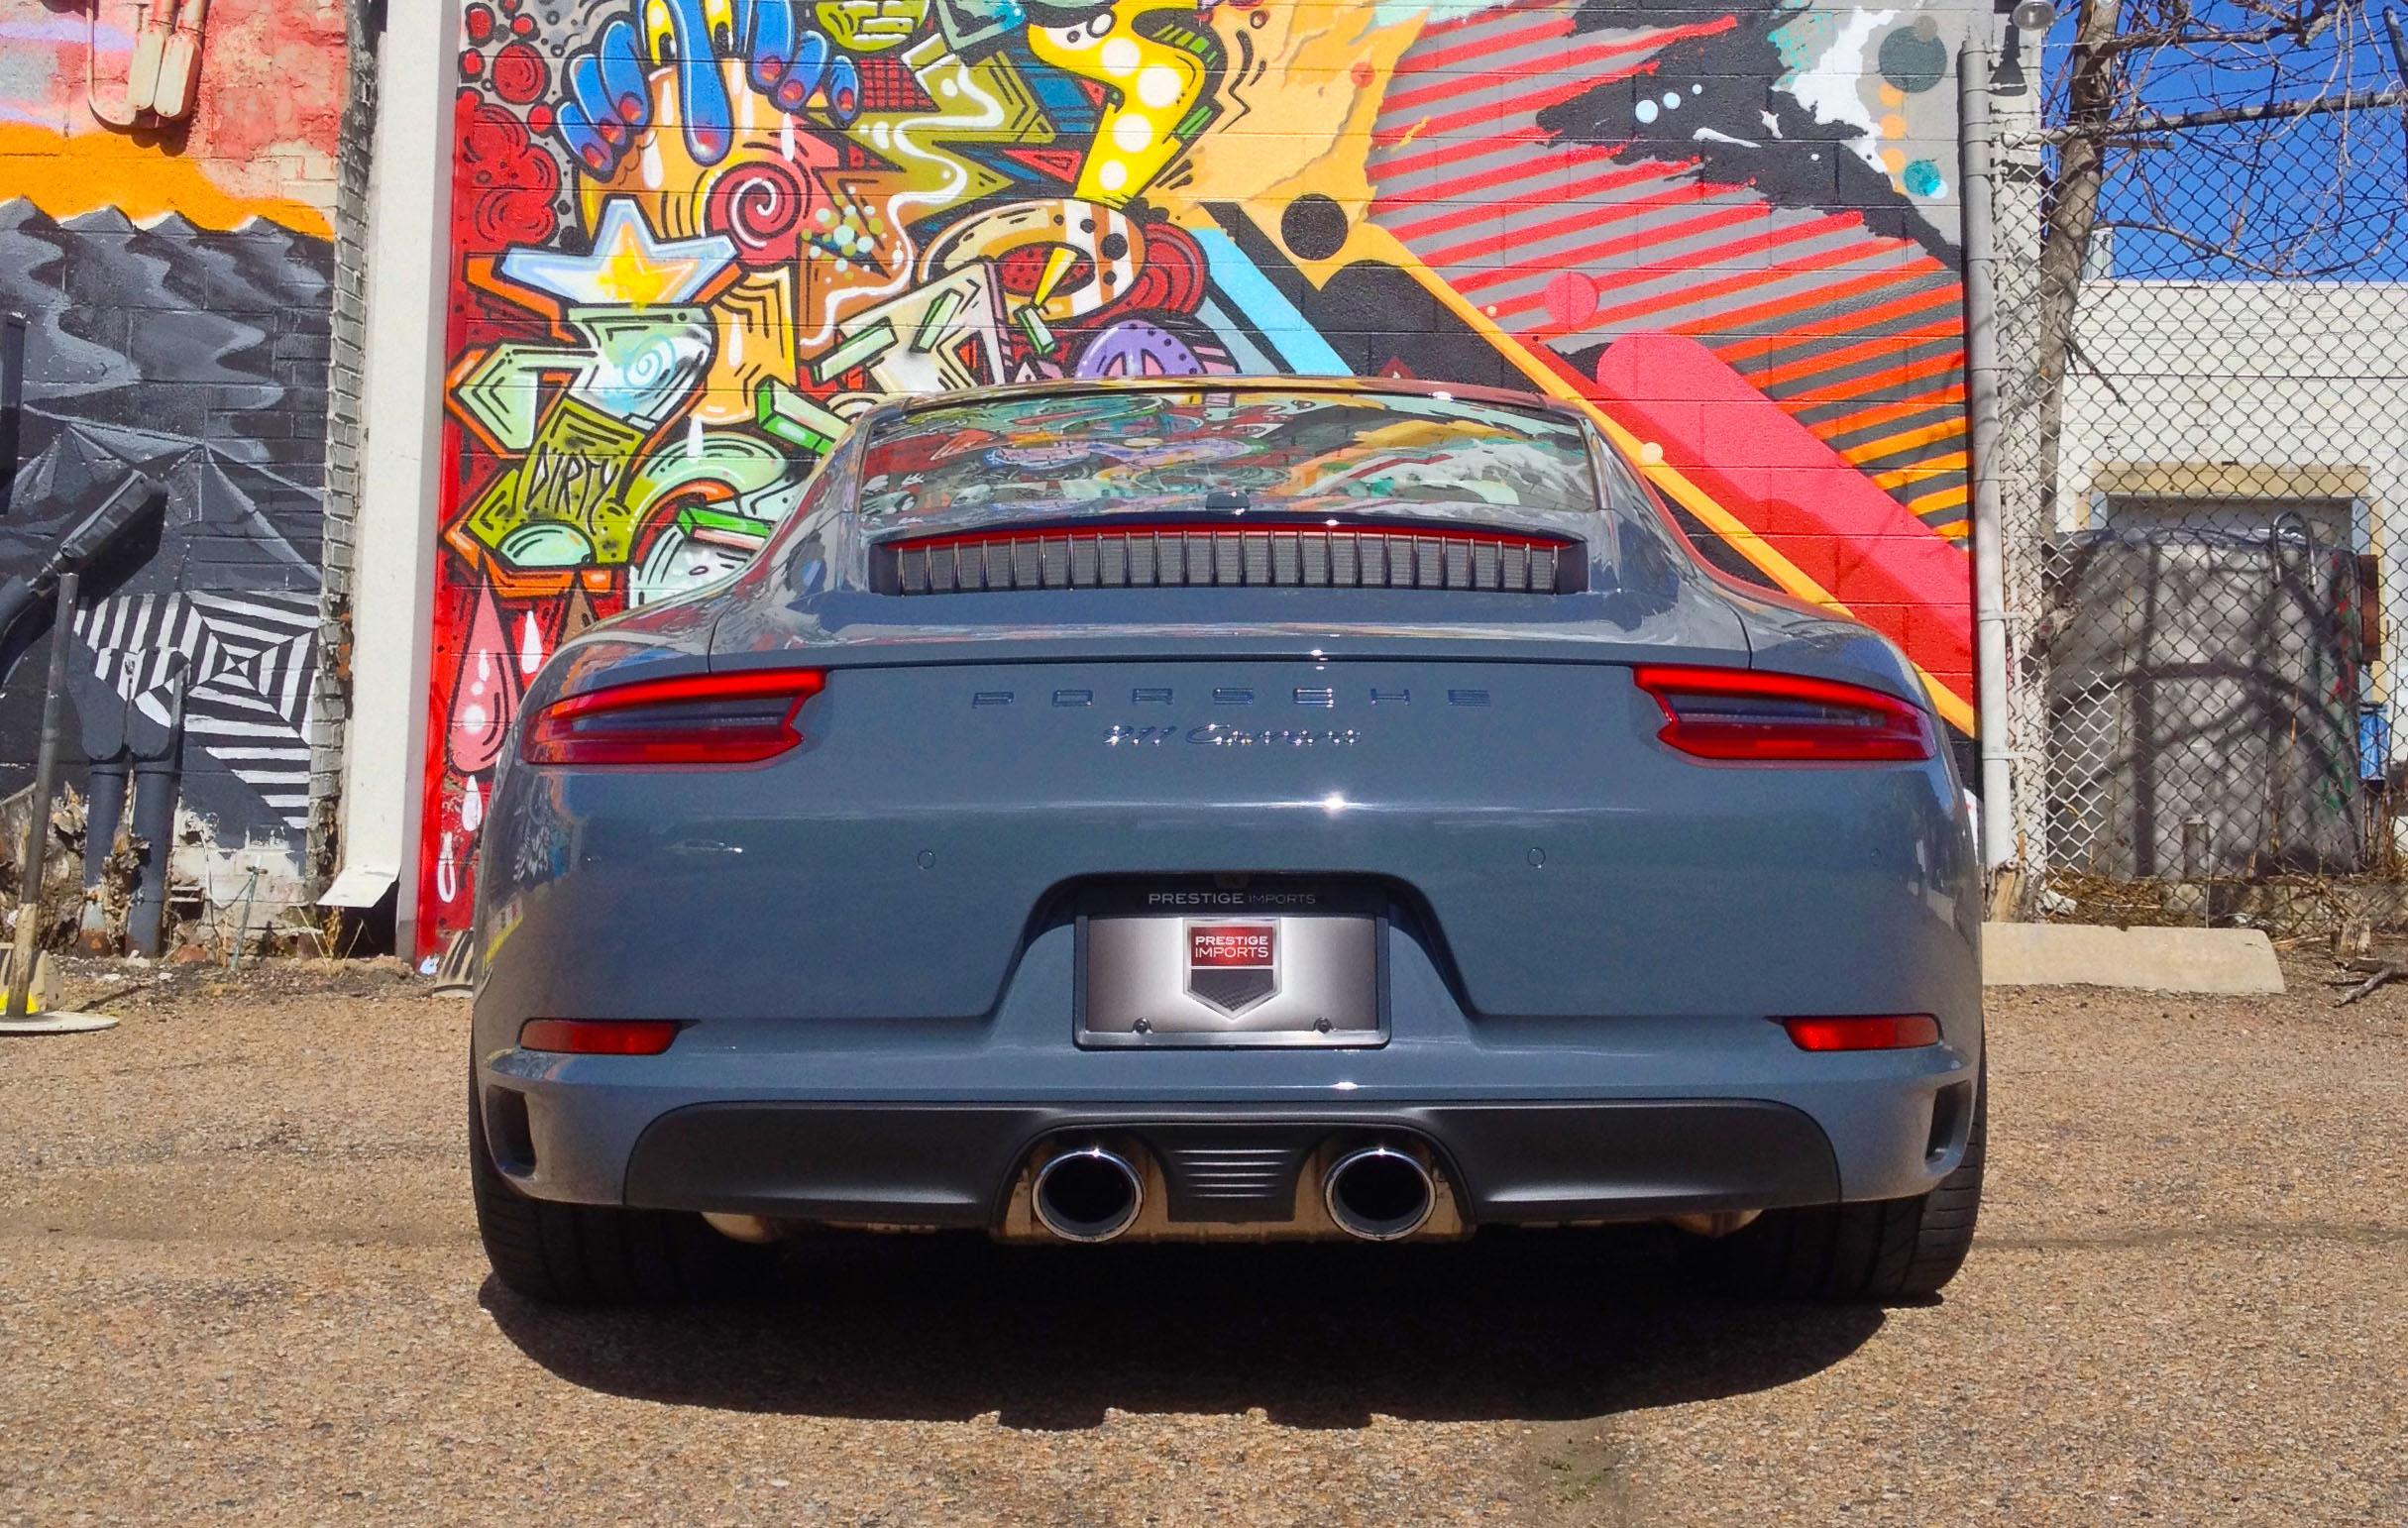 2017 Porsche 911 Carrera review - rear view